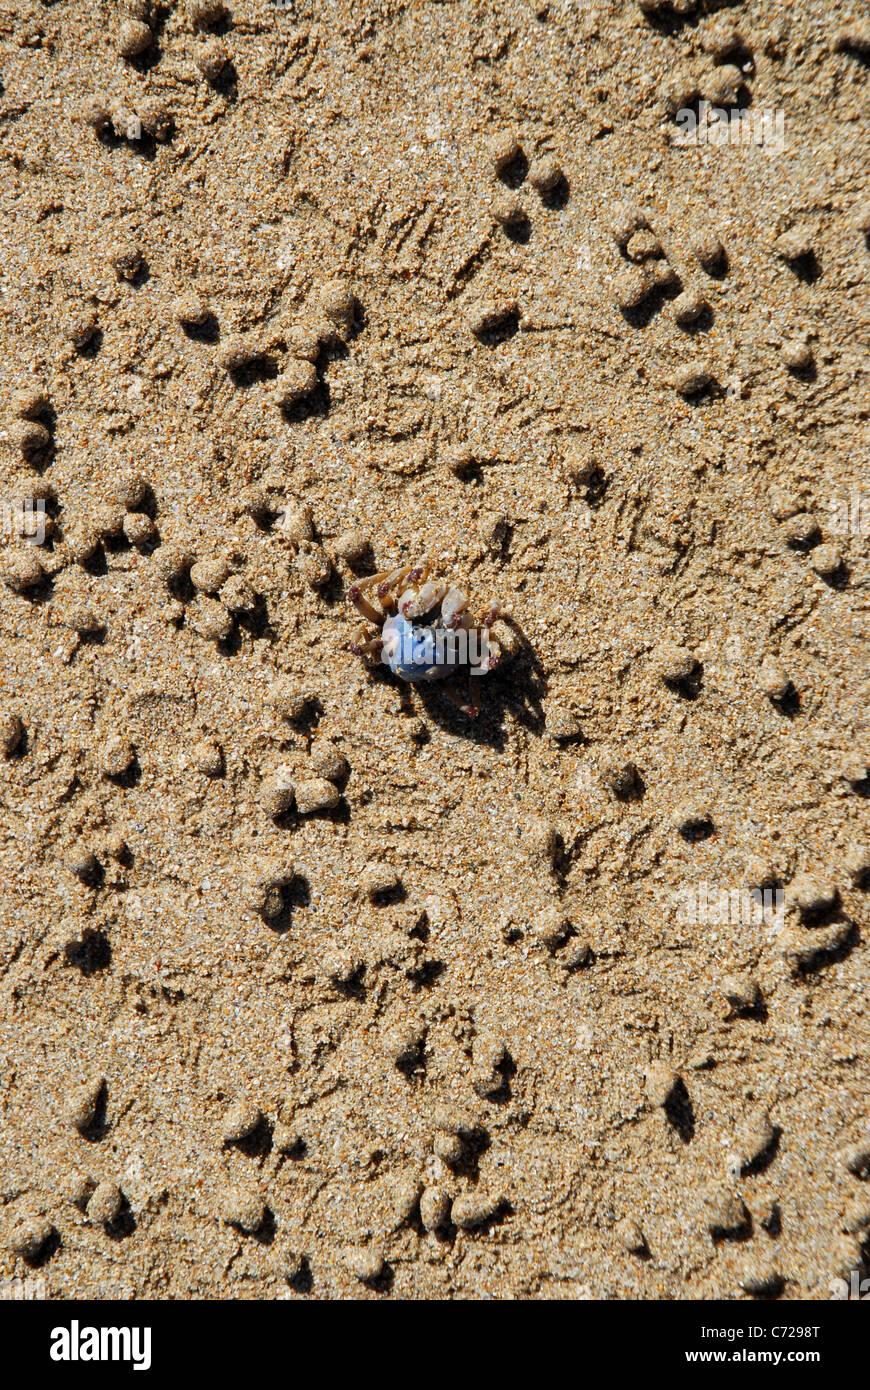 Soldier crab (Mictyris longicarpus), Florence Bay, Magnetic Island, Queensland, Australia - Stock Image